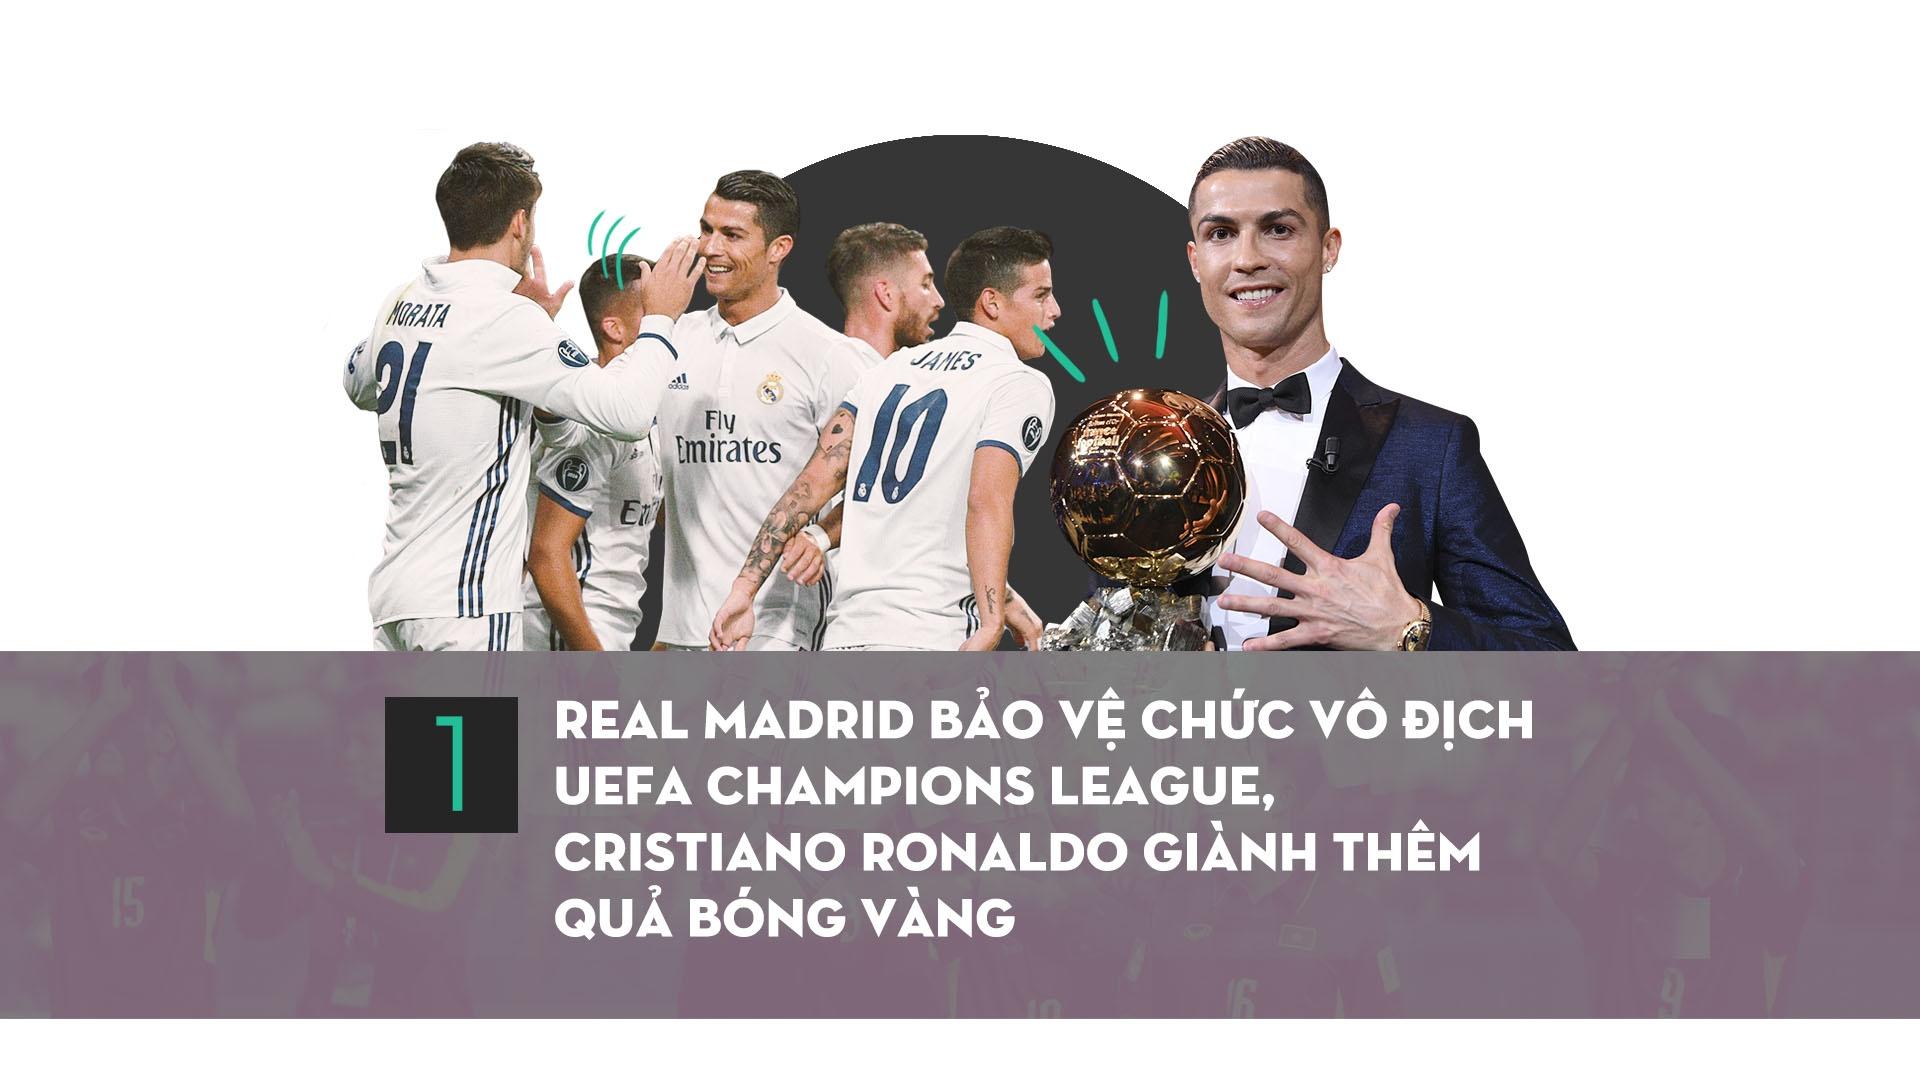 The thao the gioi 2017: Bom tan Neymar, CR7 va tran boxing bac ty hinh anh 4